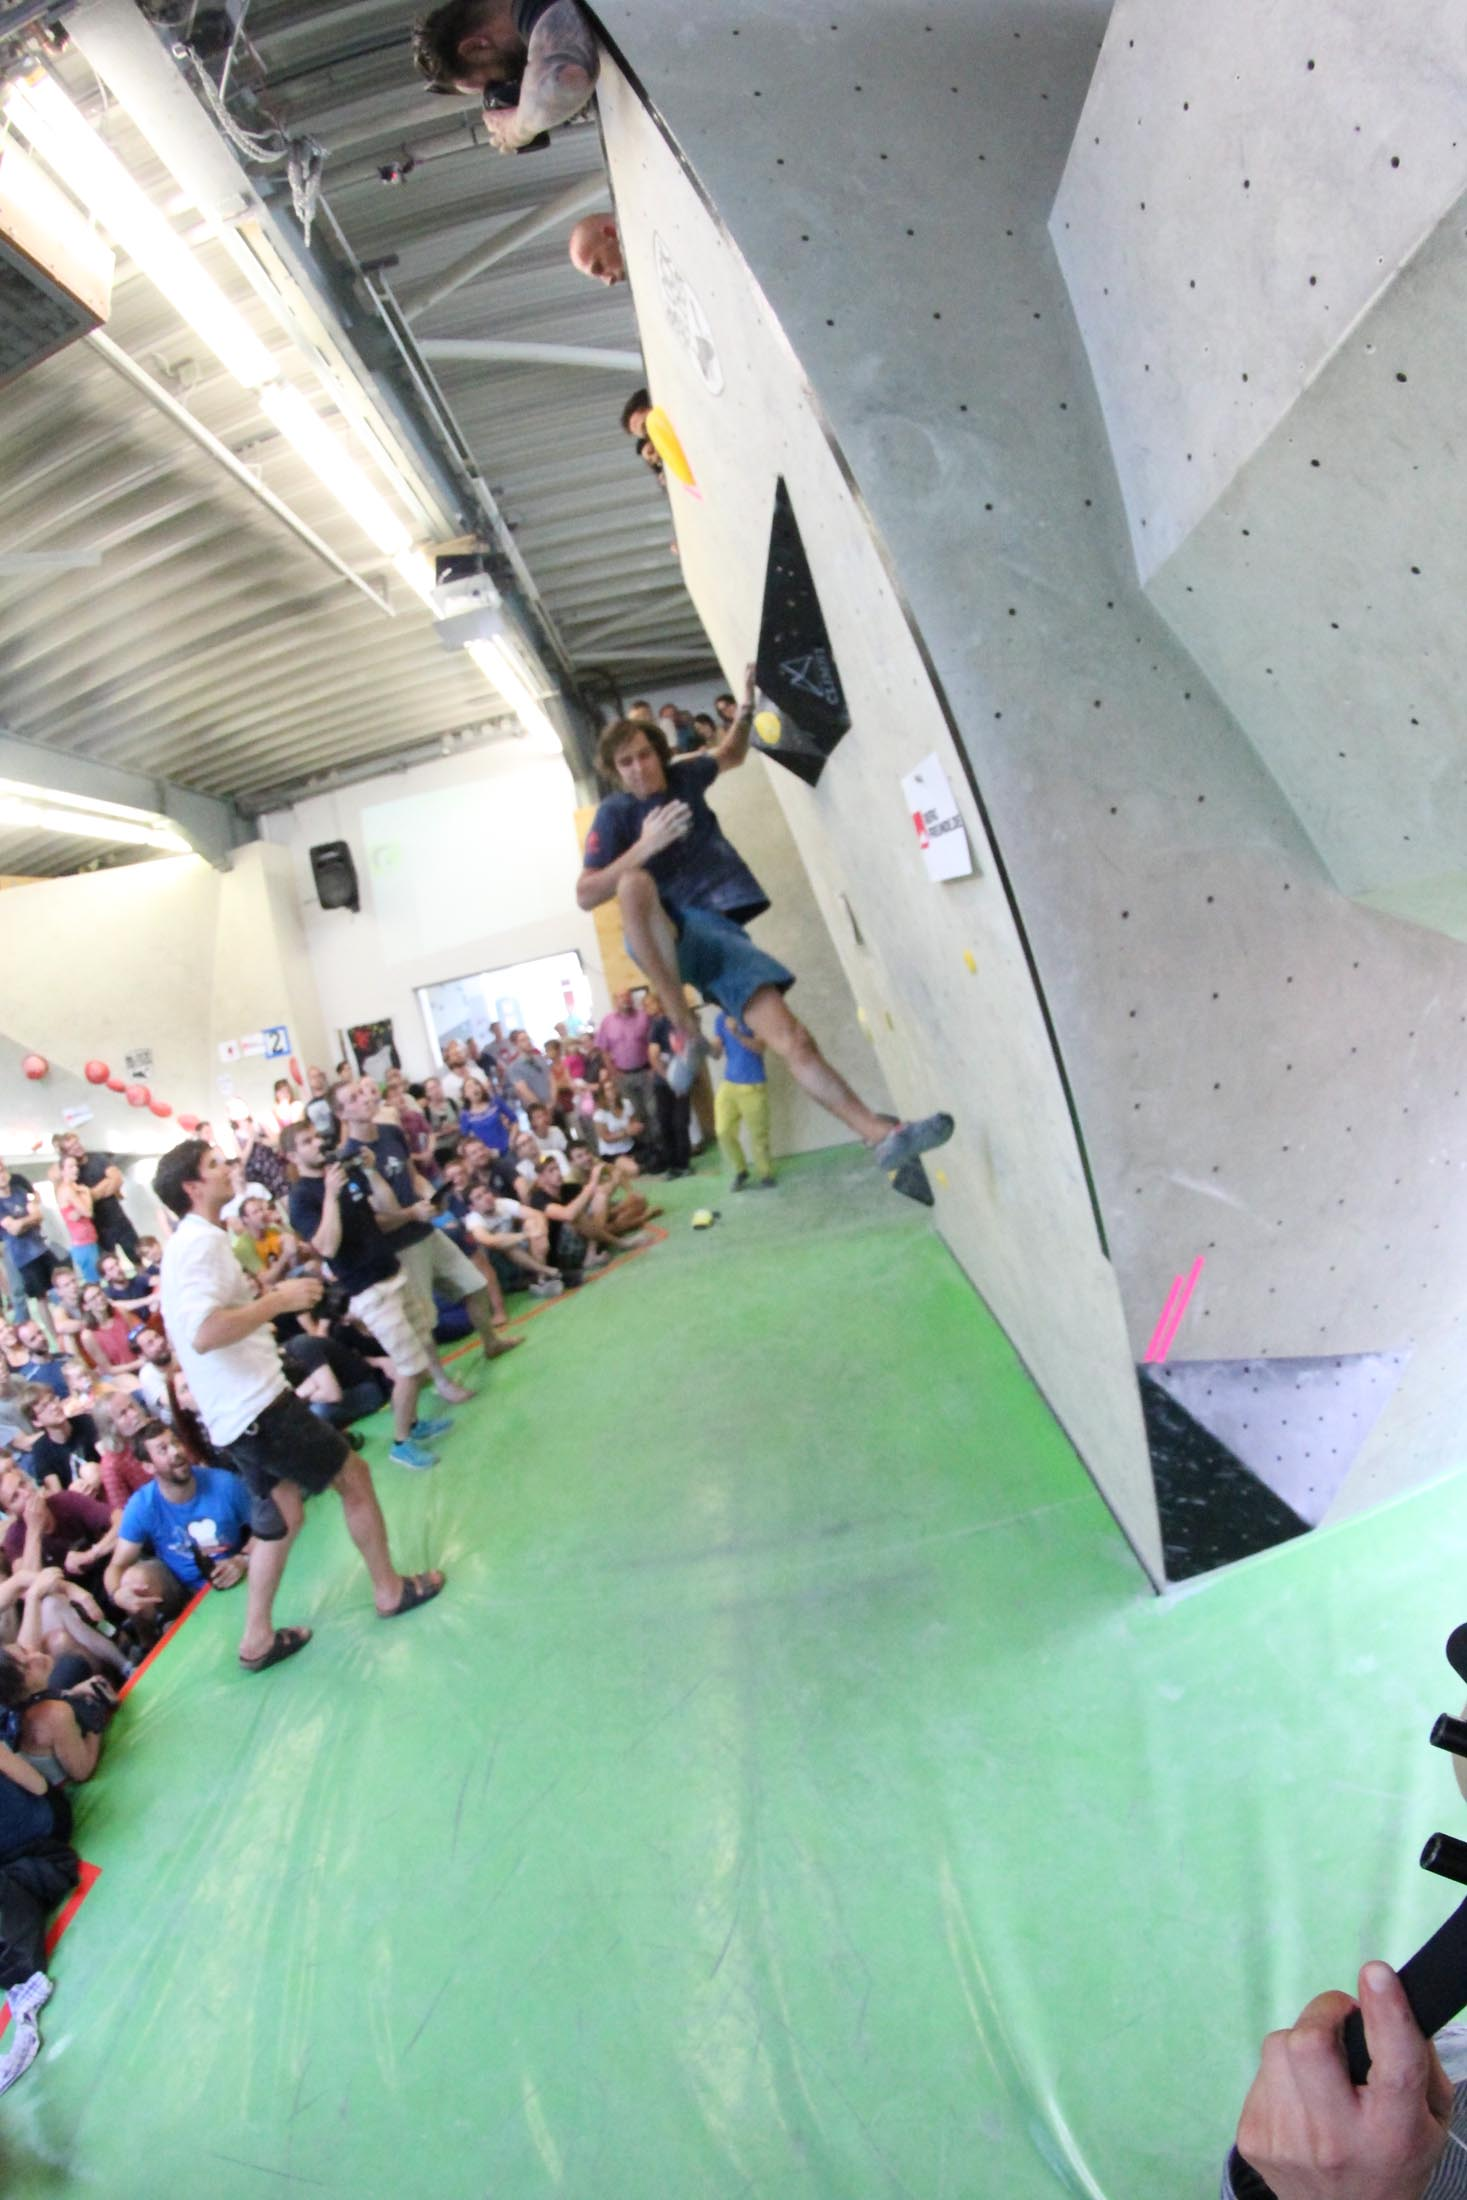 Finale, internationaler bouldercup Frankenjura 2016, BLOCKHELDEN Erlangen, Mammut, Bergfreunde.de, Boulderwettkampf07092016504